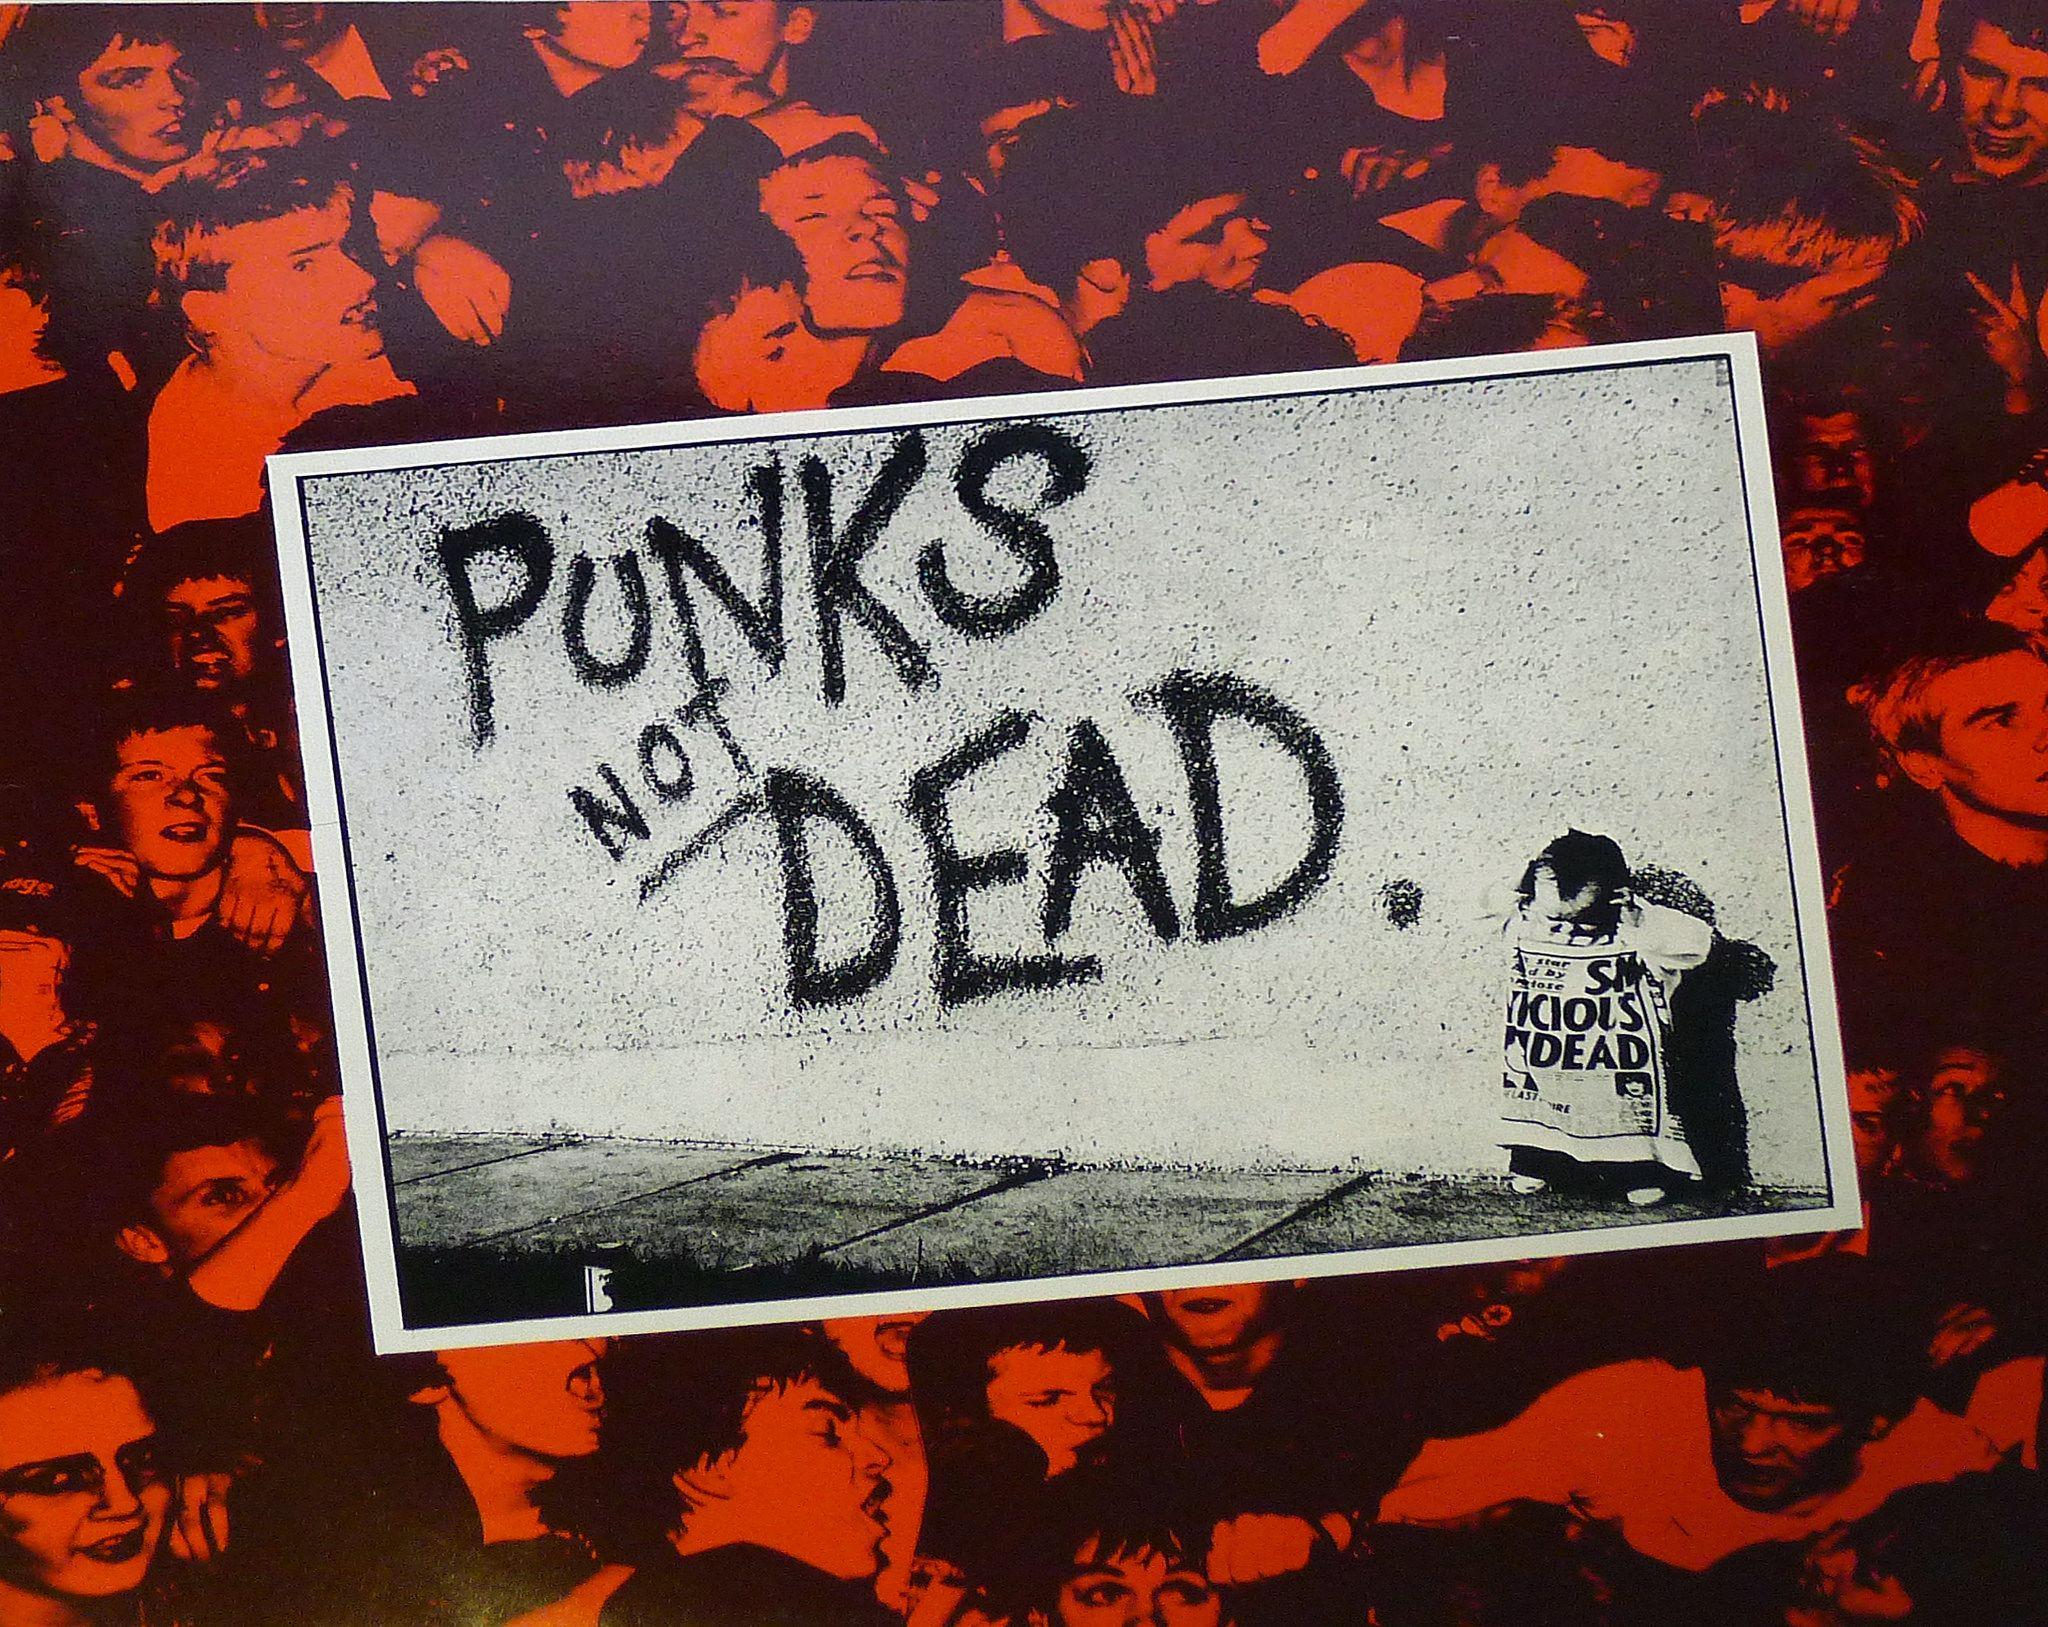 The Exploited Punk S Not Dead Rr 12 Lp Vinyl Punks Not Dead Punk Exploitation